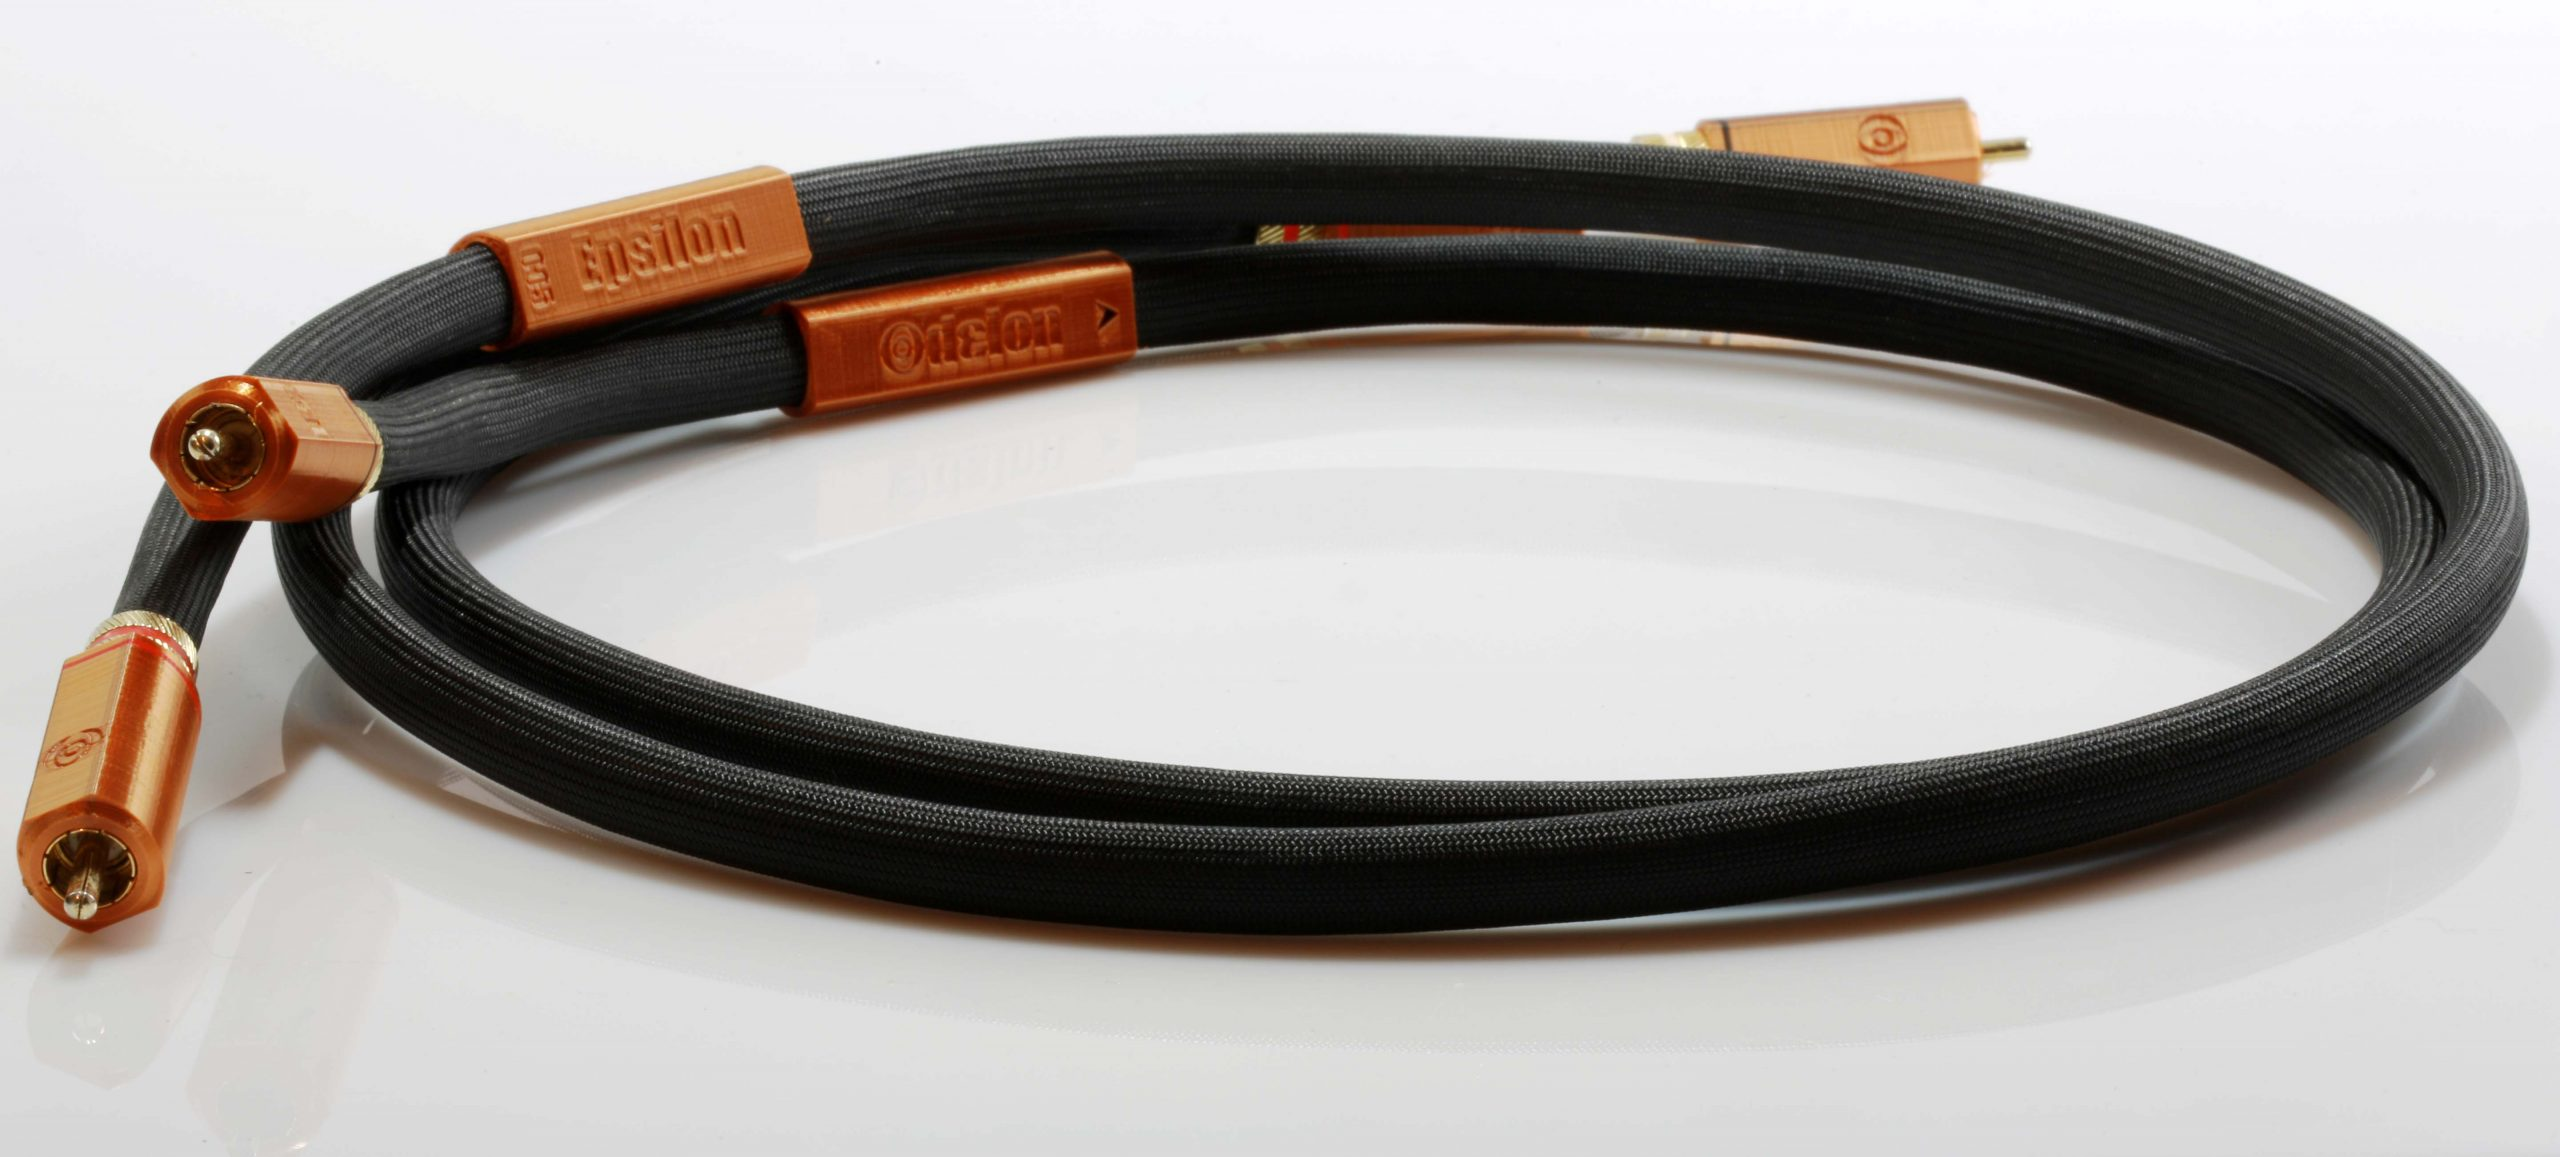 Epsilon Modulation RCA Odeion Cable